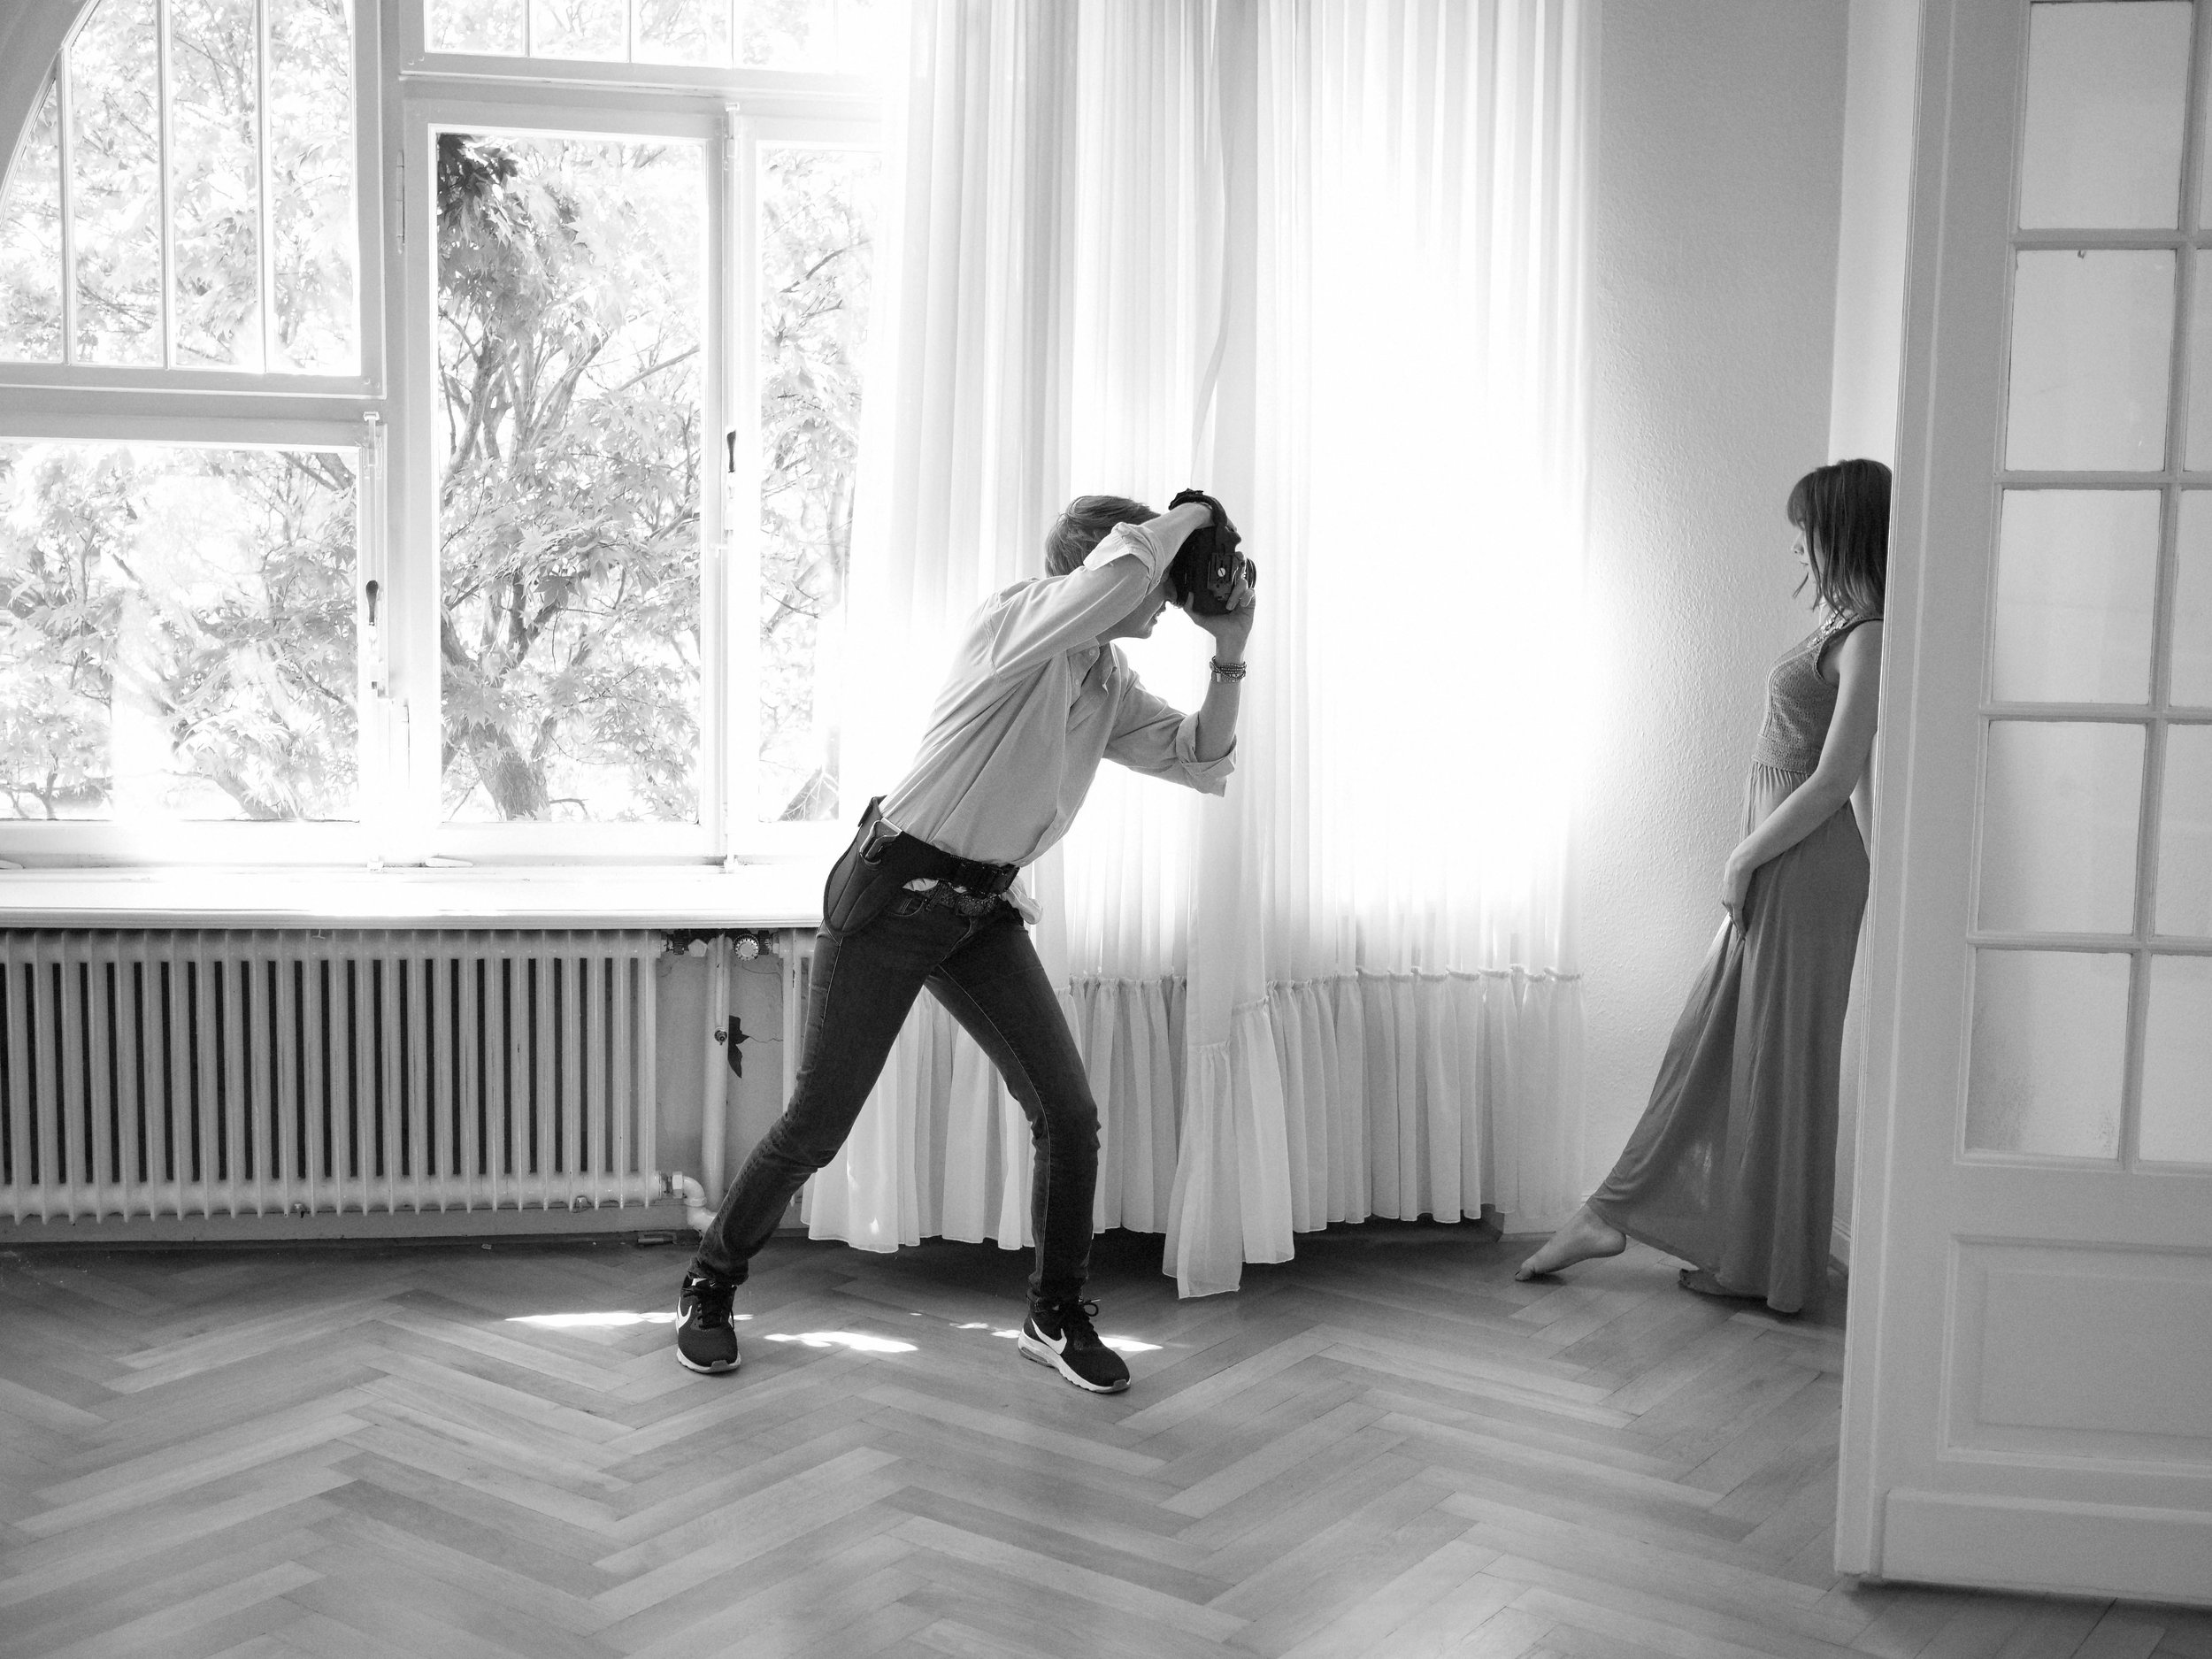 P1022359_Exp Fotografie Workshop Bonn Portraitfotografie.jpg